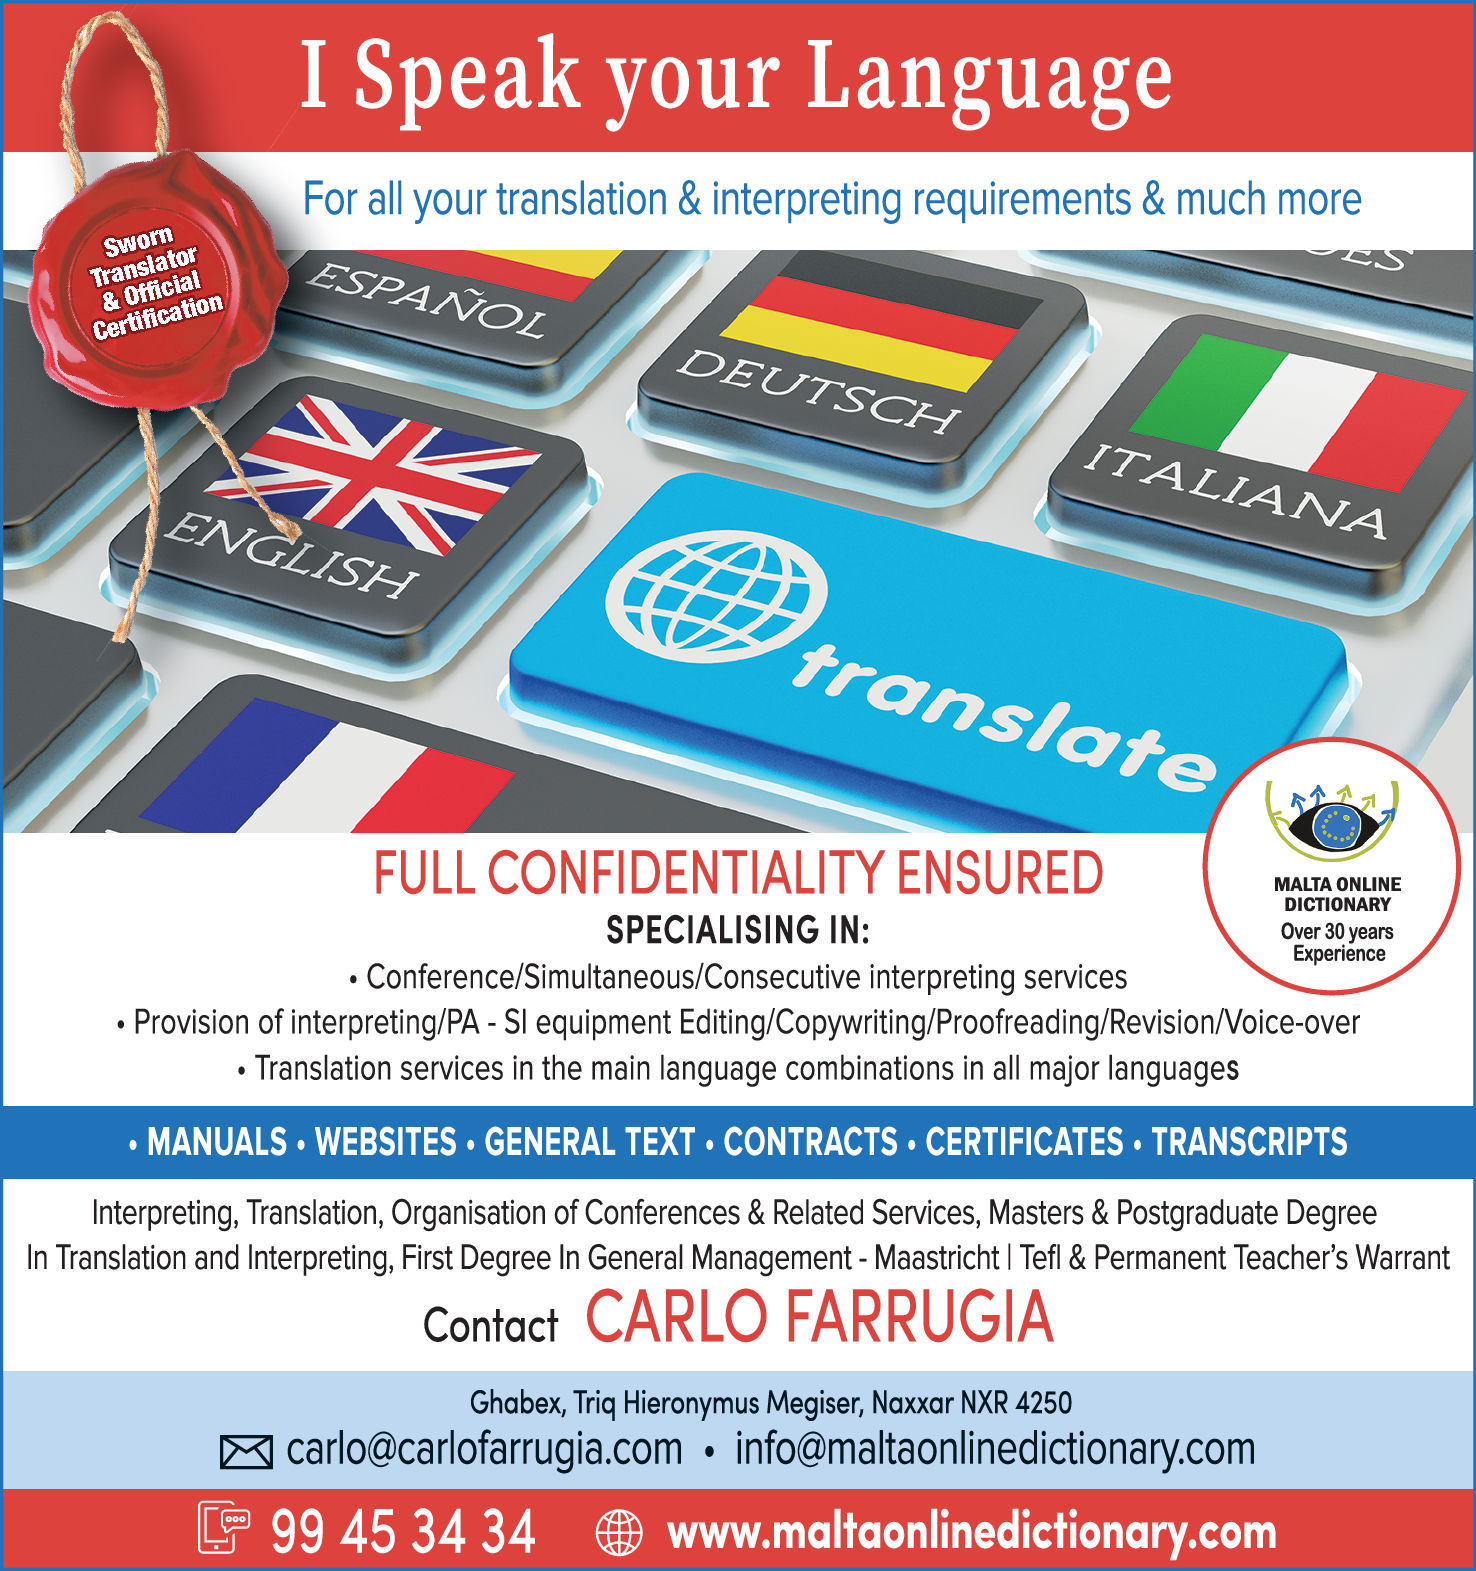 Carlo Farrugia - Malta Online Dictionary Ltd Interpreting